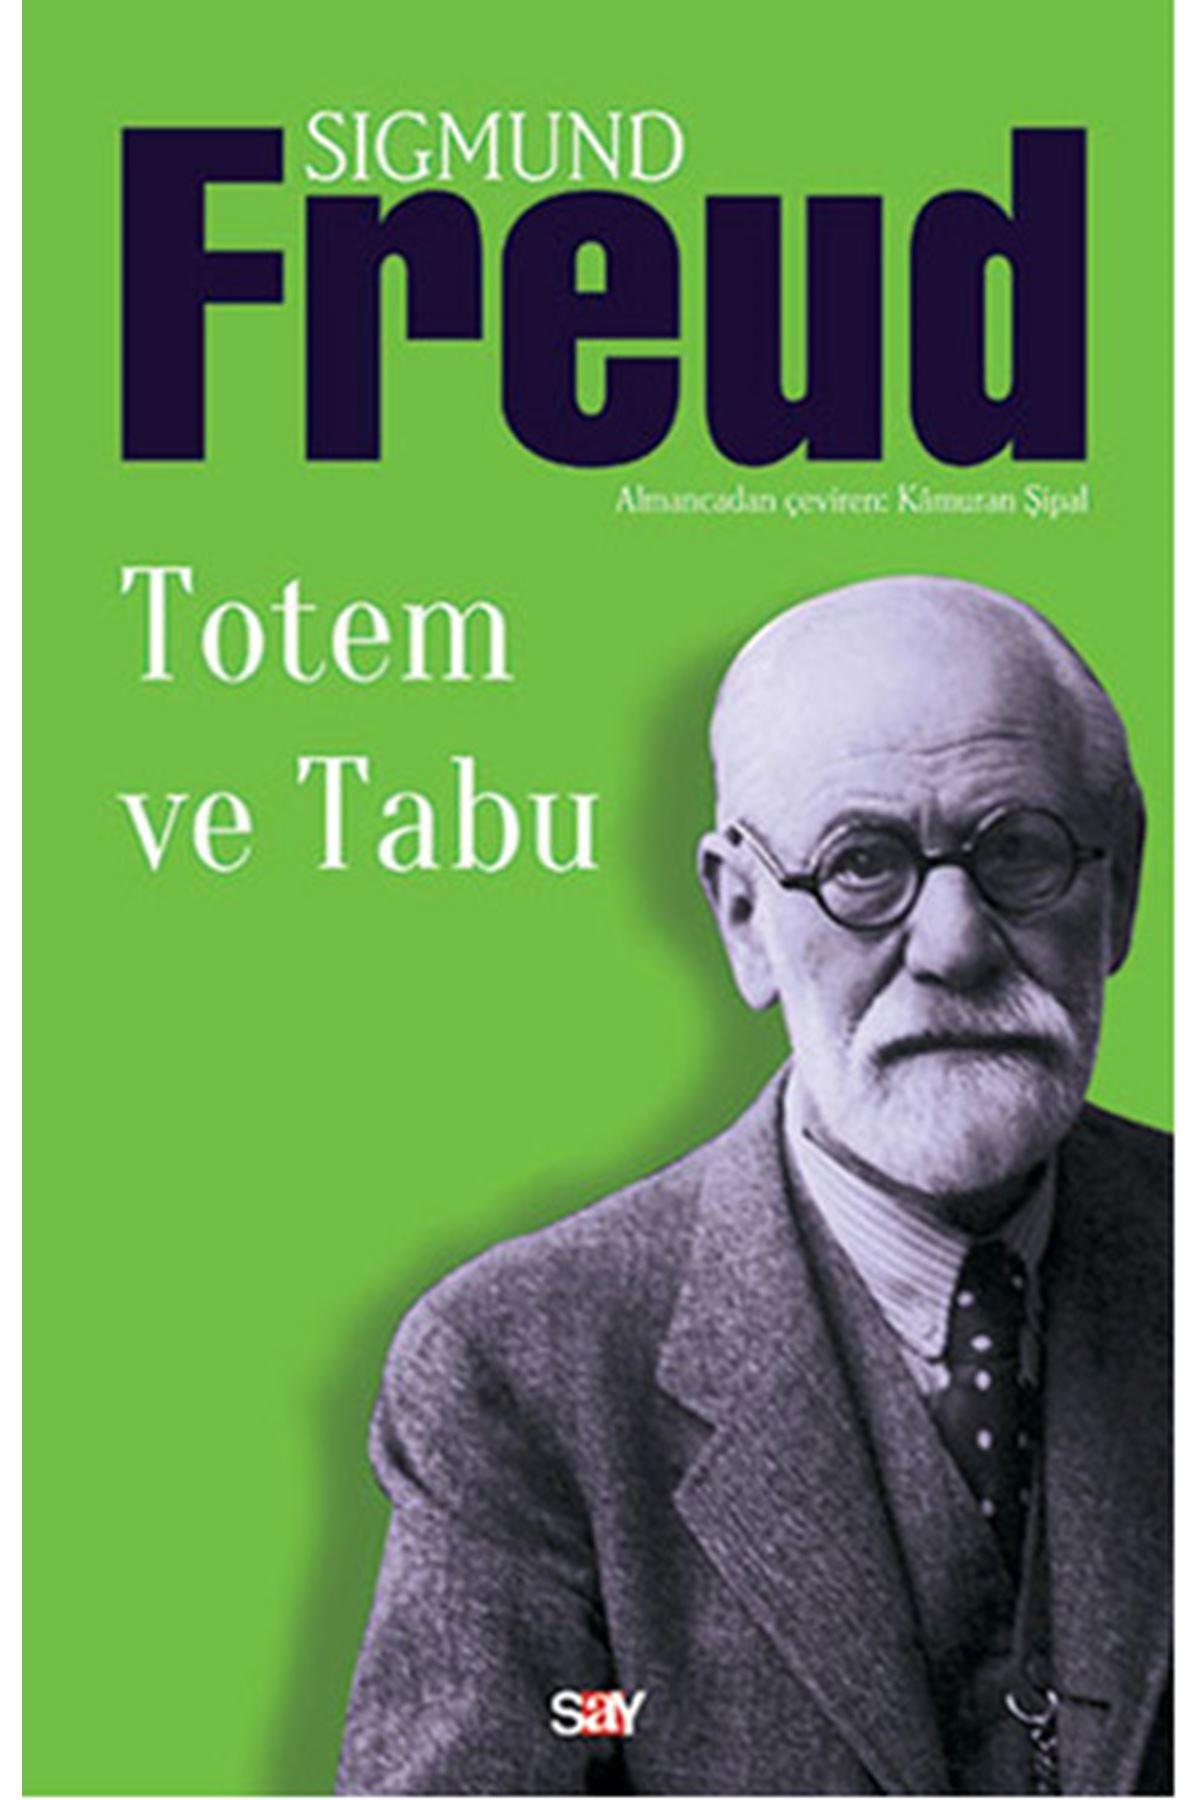 FREUD - TOTEM VE TABU